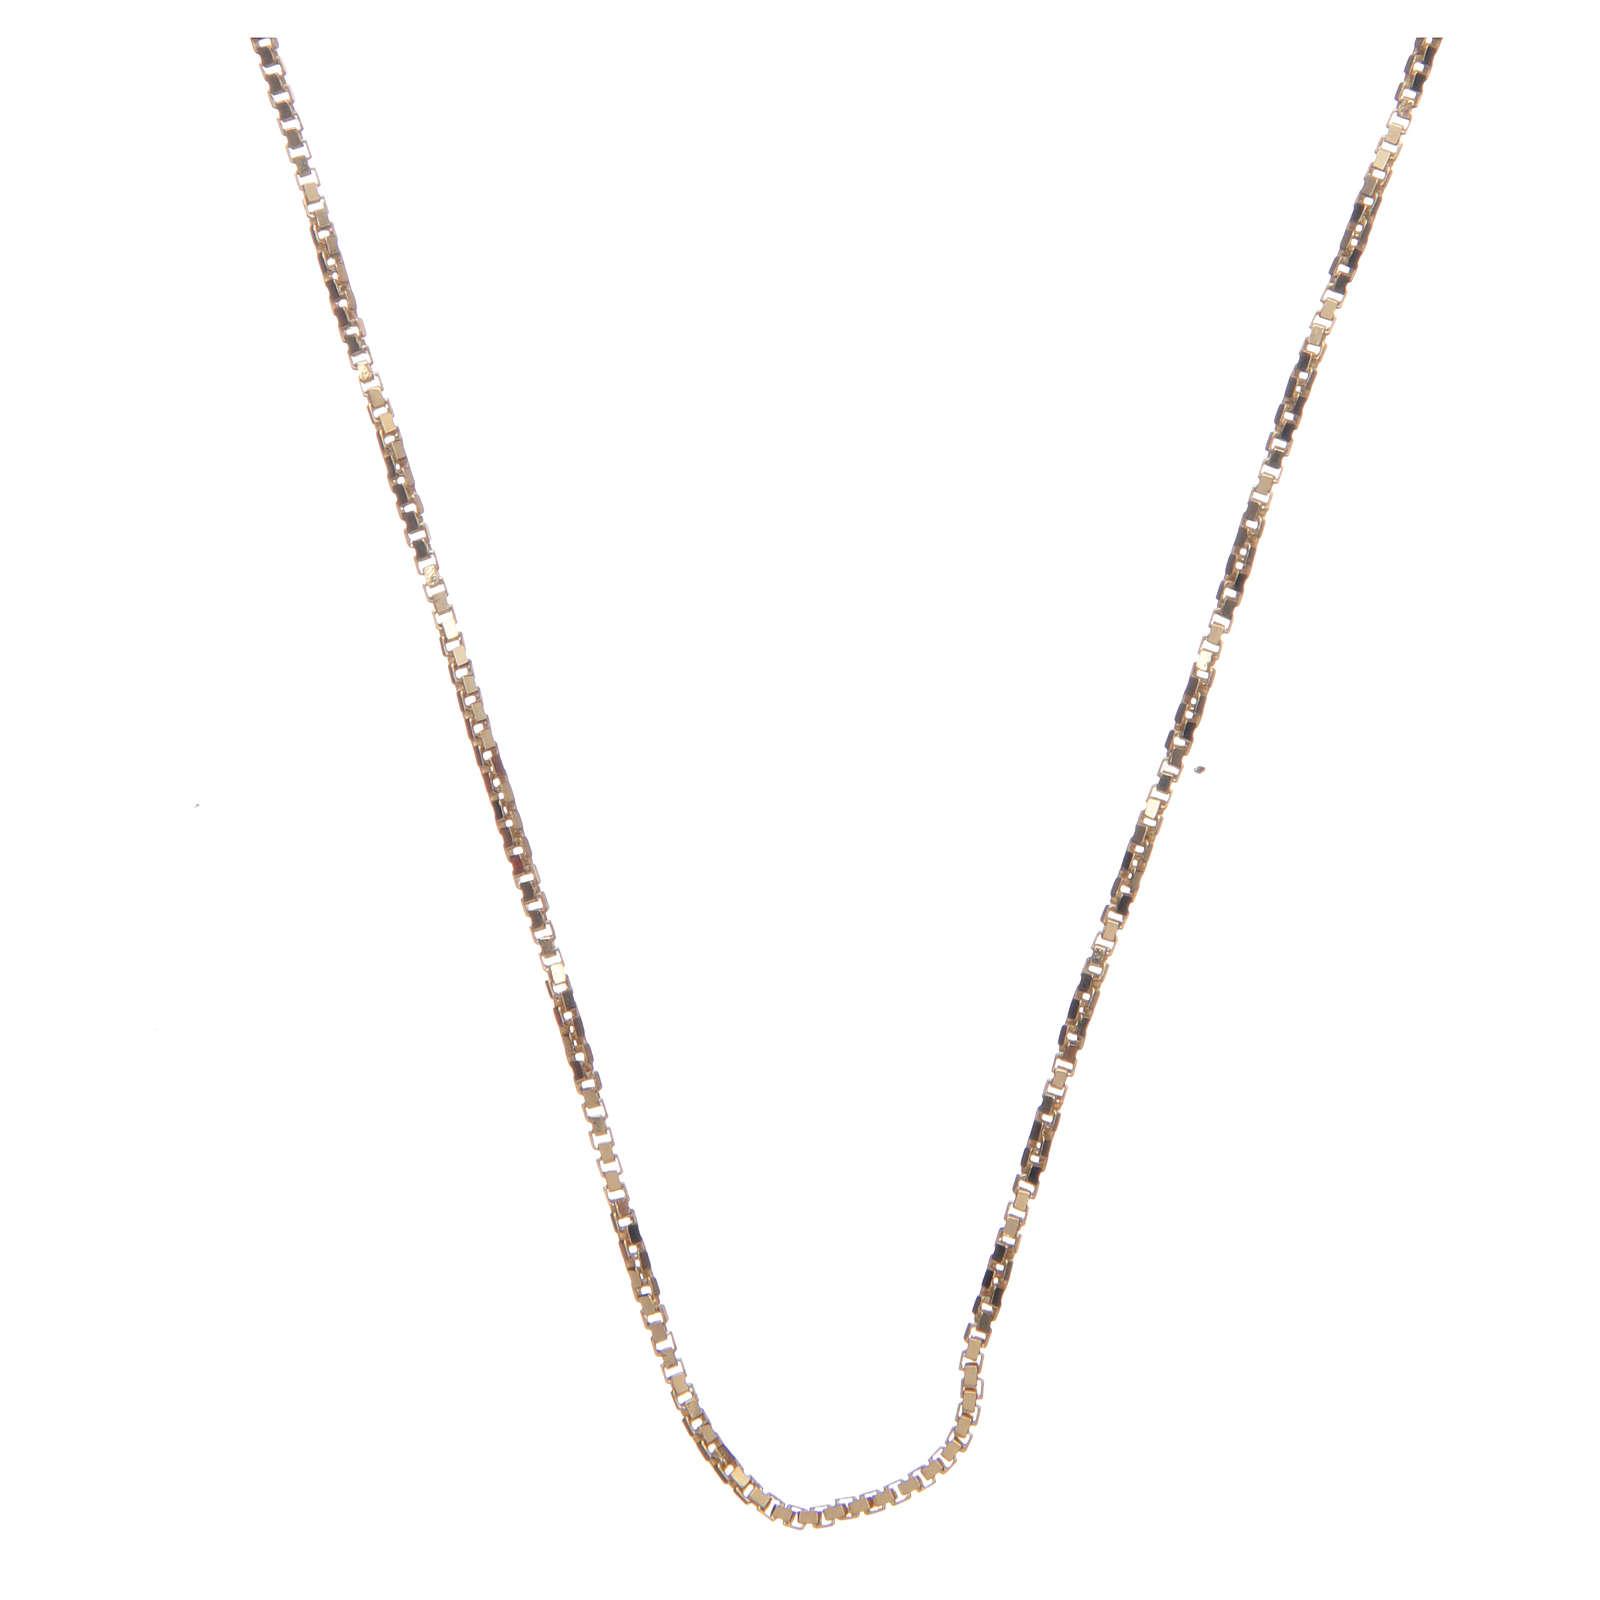 Catena veneta argento 925 dorato 70 cm 4